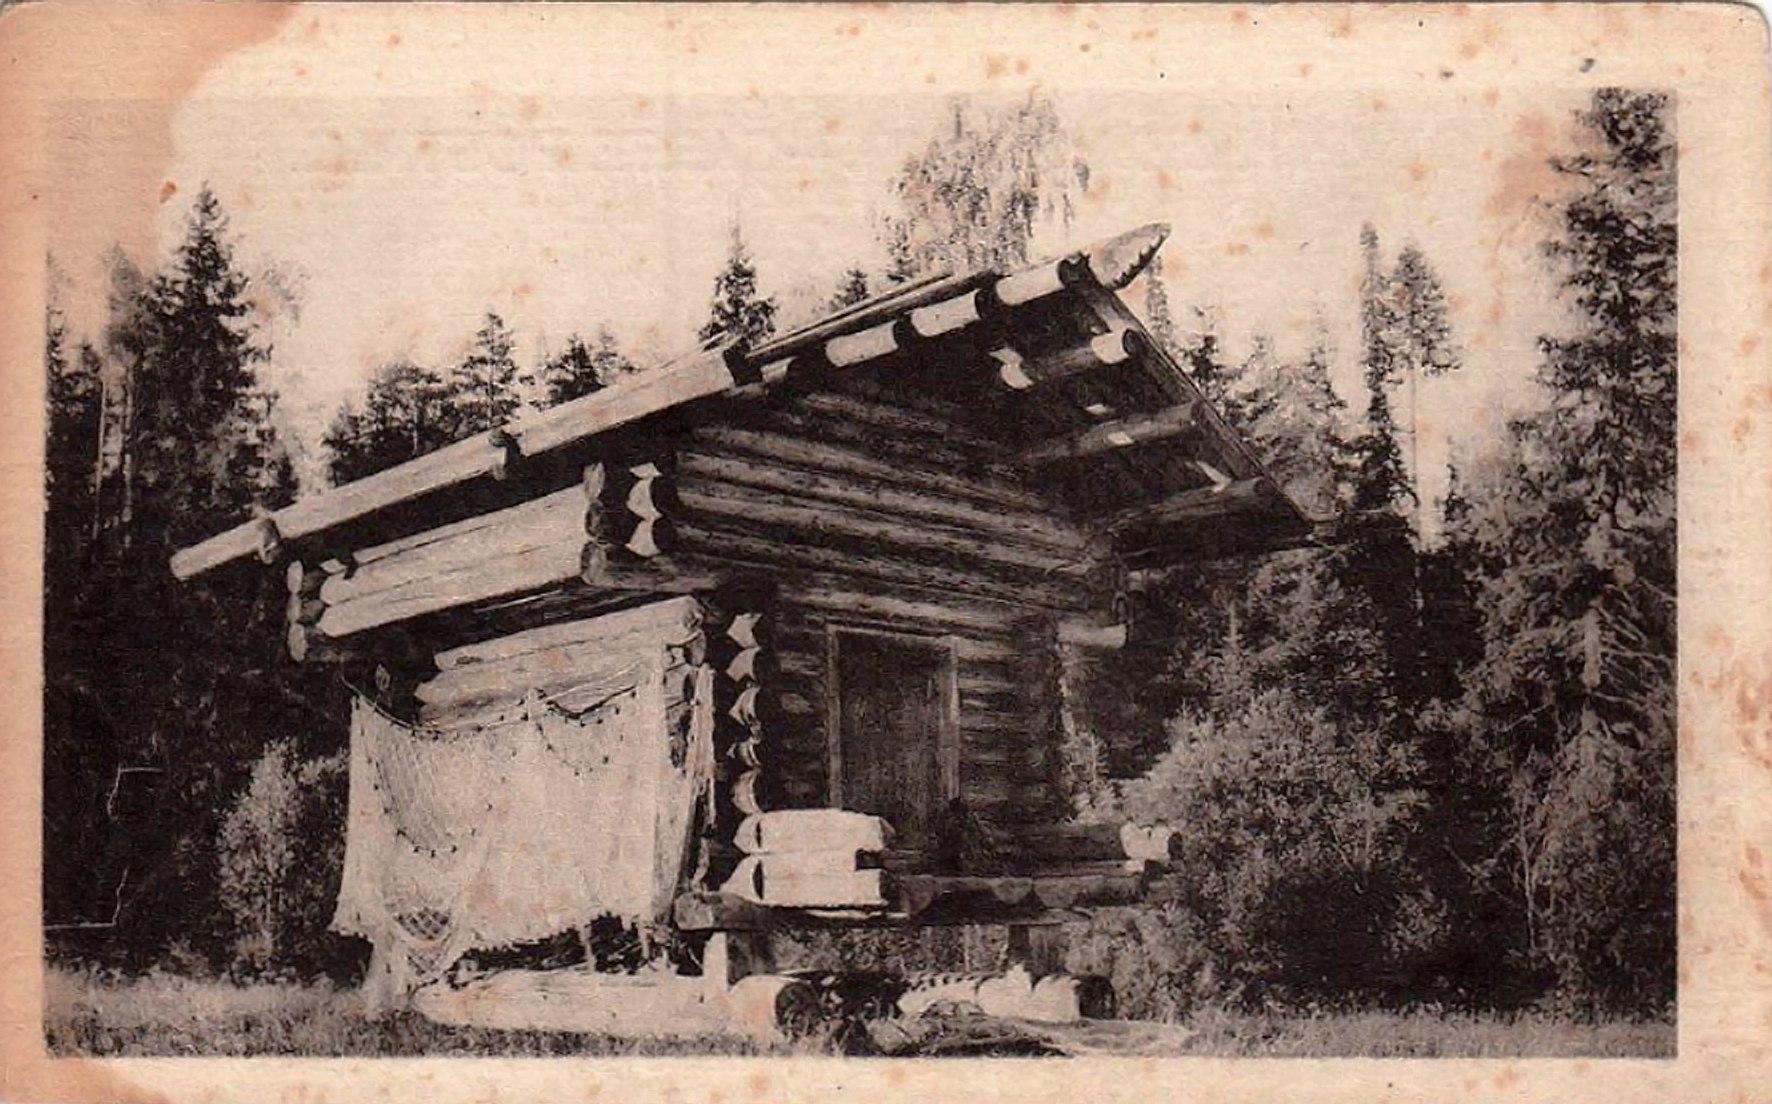 Окрестности Сольвычегодска. Амбар на берегу реки Уфтюга Сольвычегодского уезда